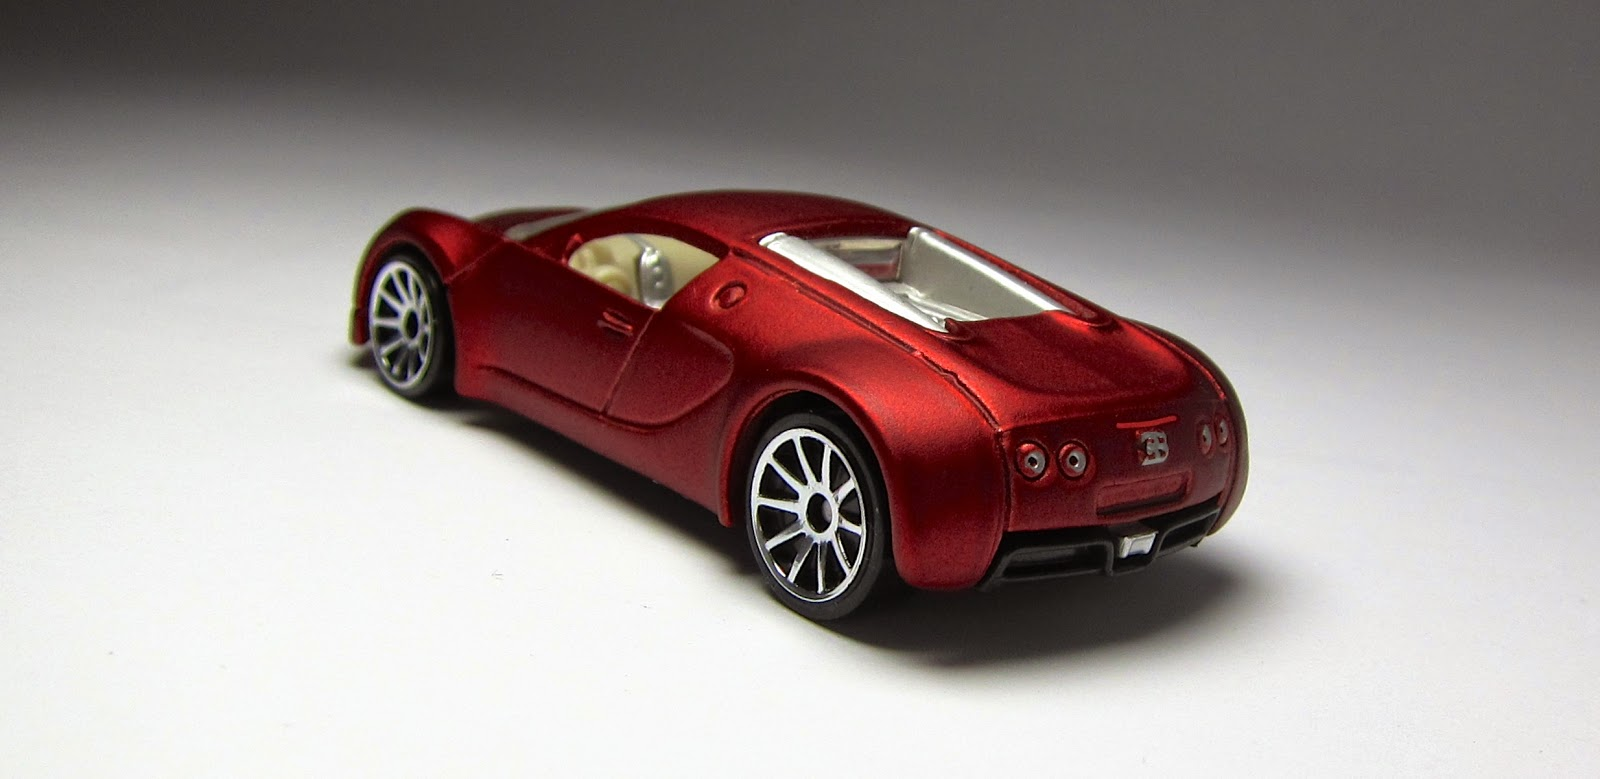 bugatti veyron side cake ideas and designs. Black Bedroom Furniture Sets. Home Design Ideas